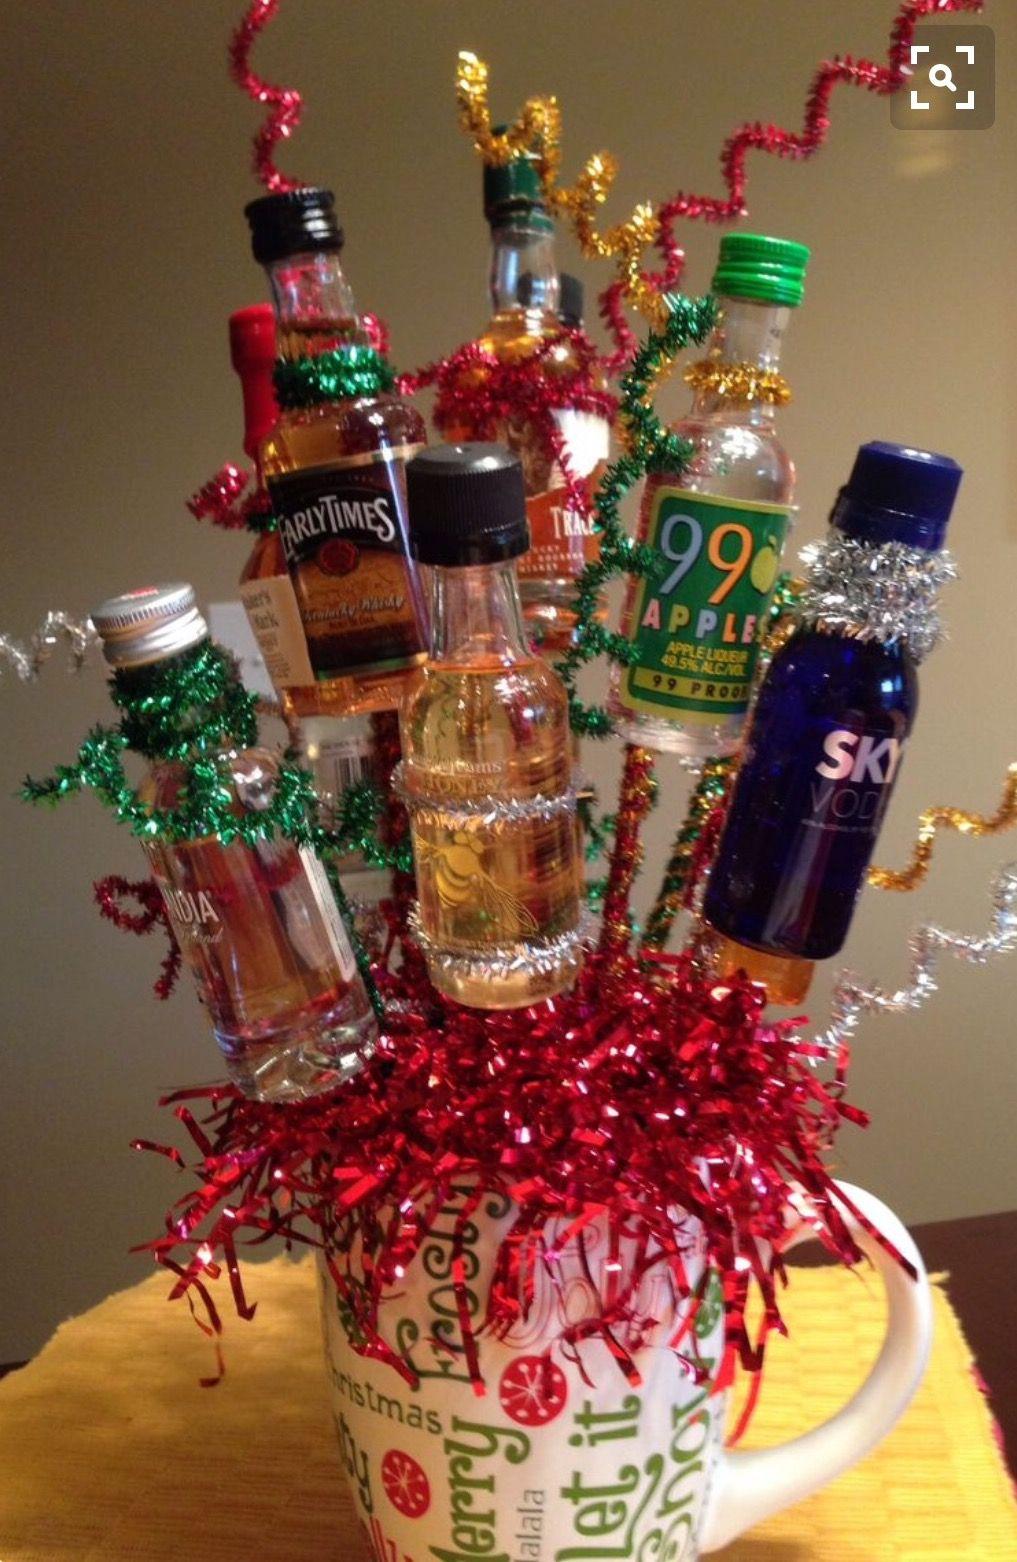 Pin by Lorri Klocke on Christmas Gift Ideas | Pinterest | Christmas ...